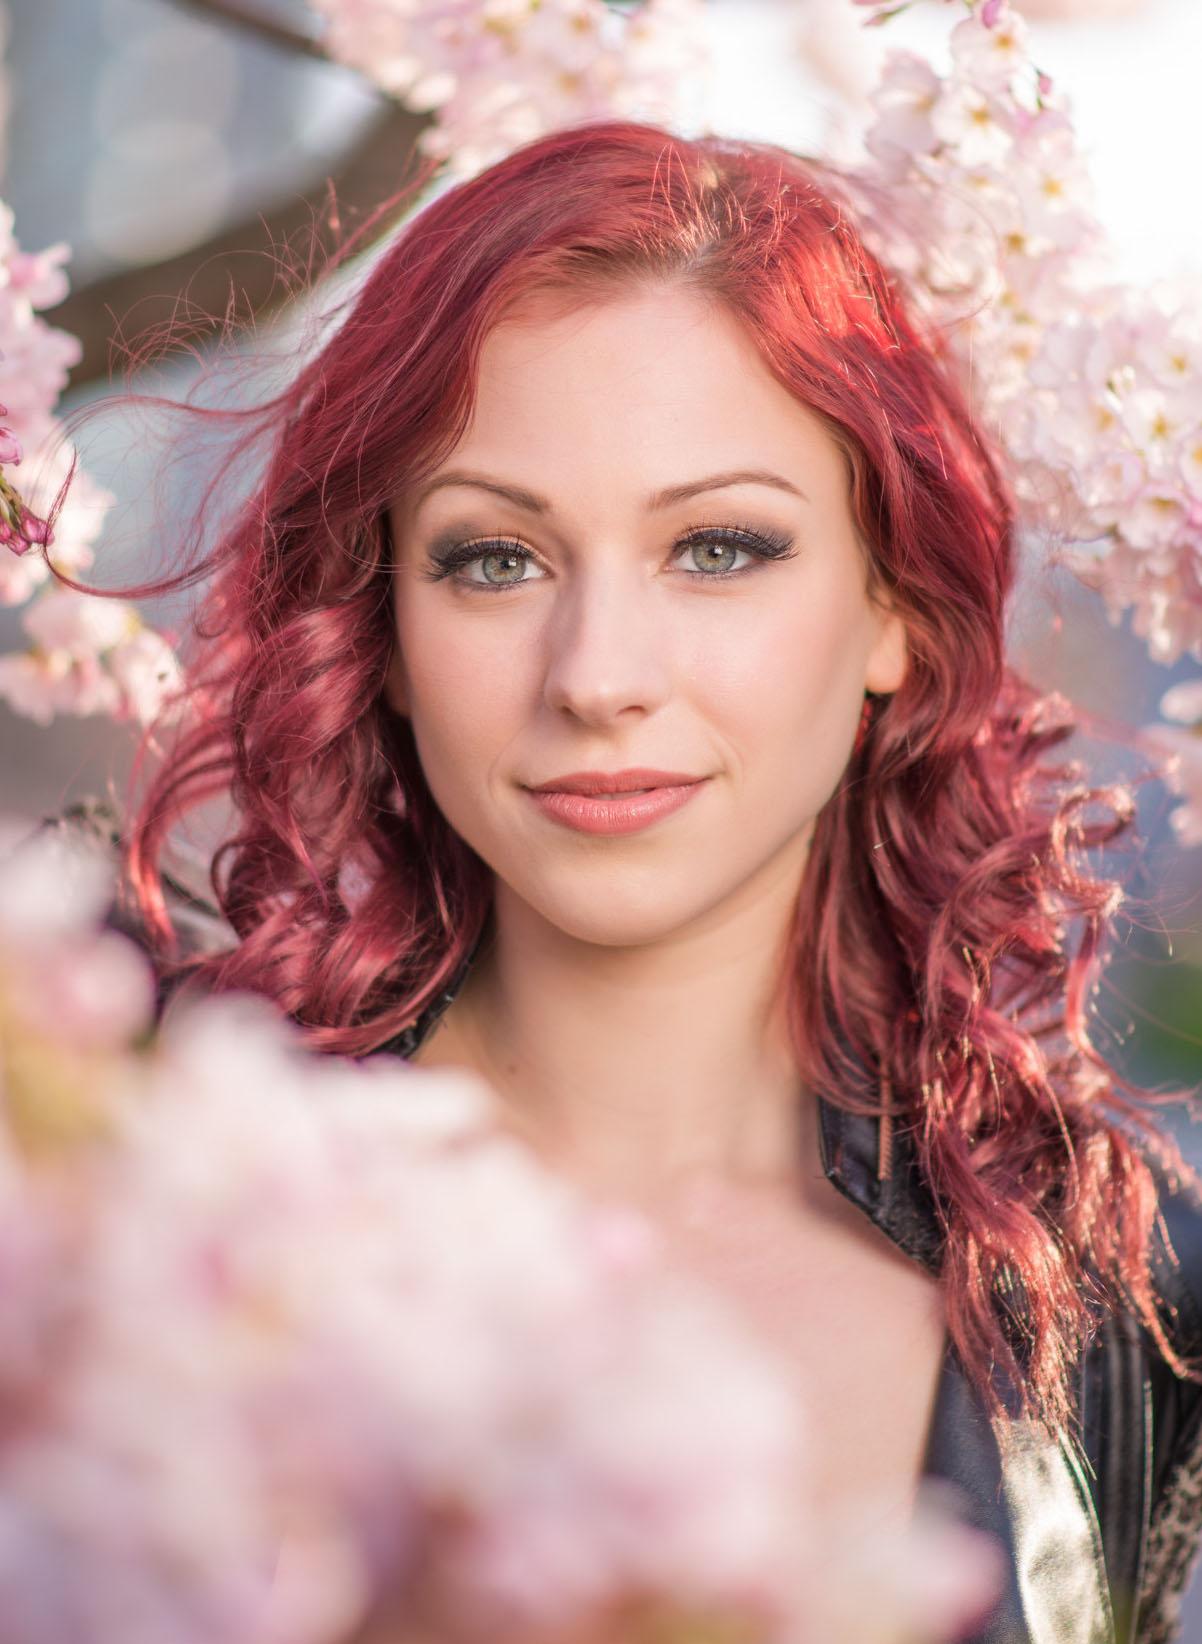 Jocelyn_Glamour.jpg